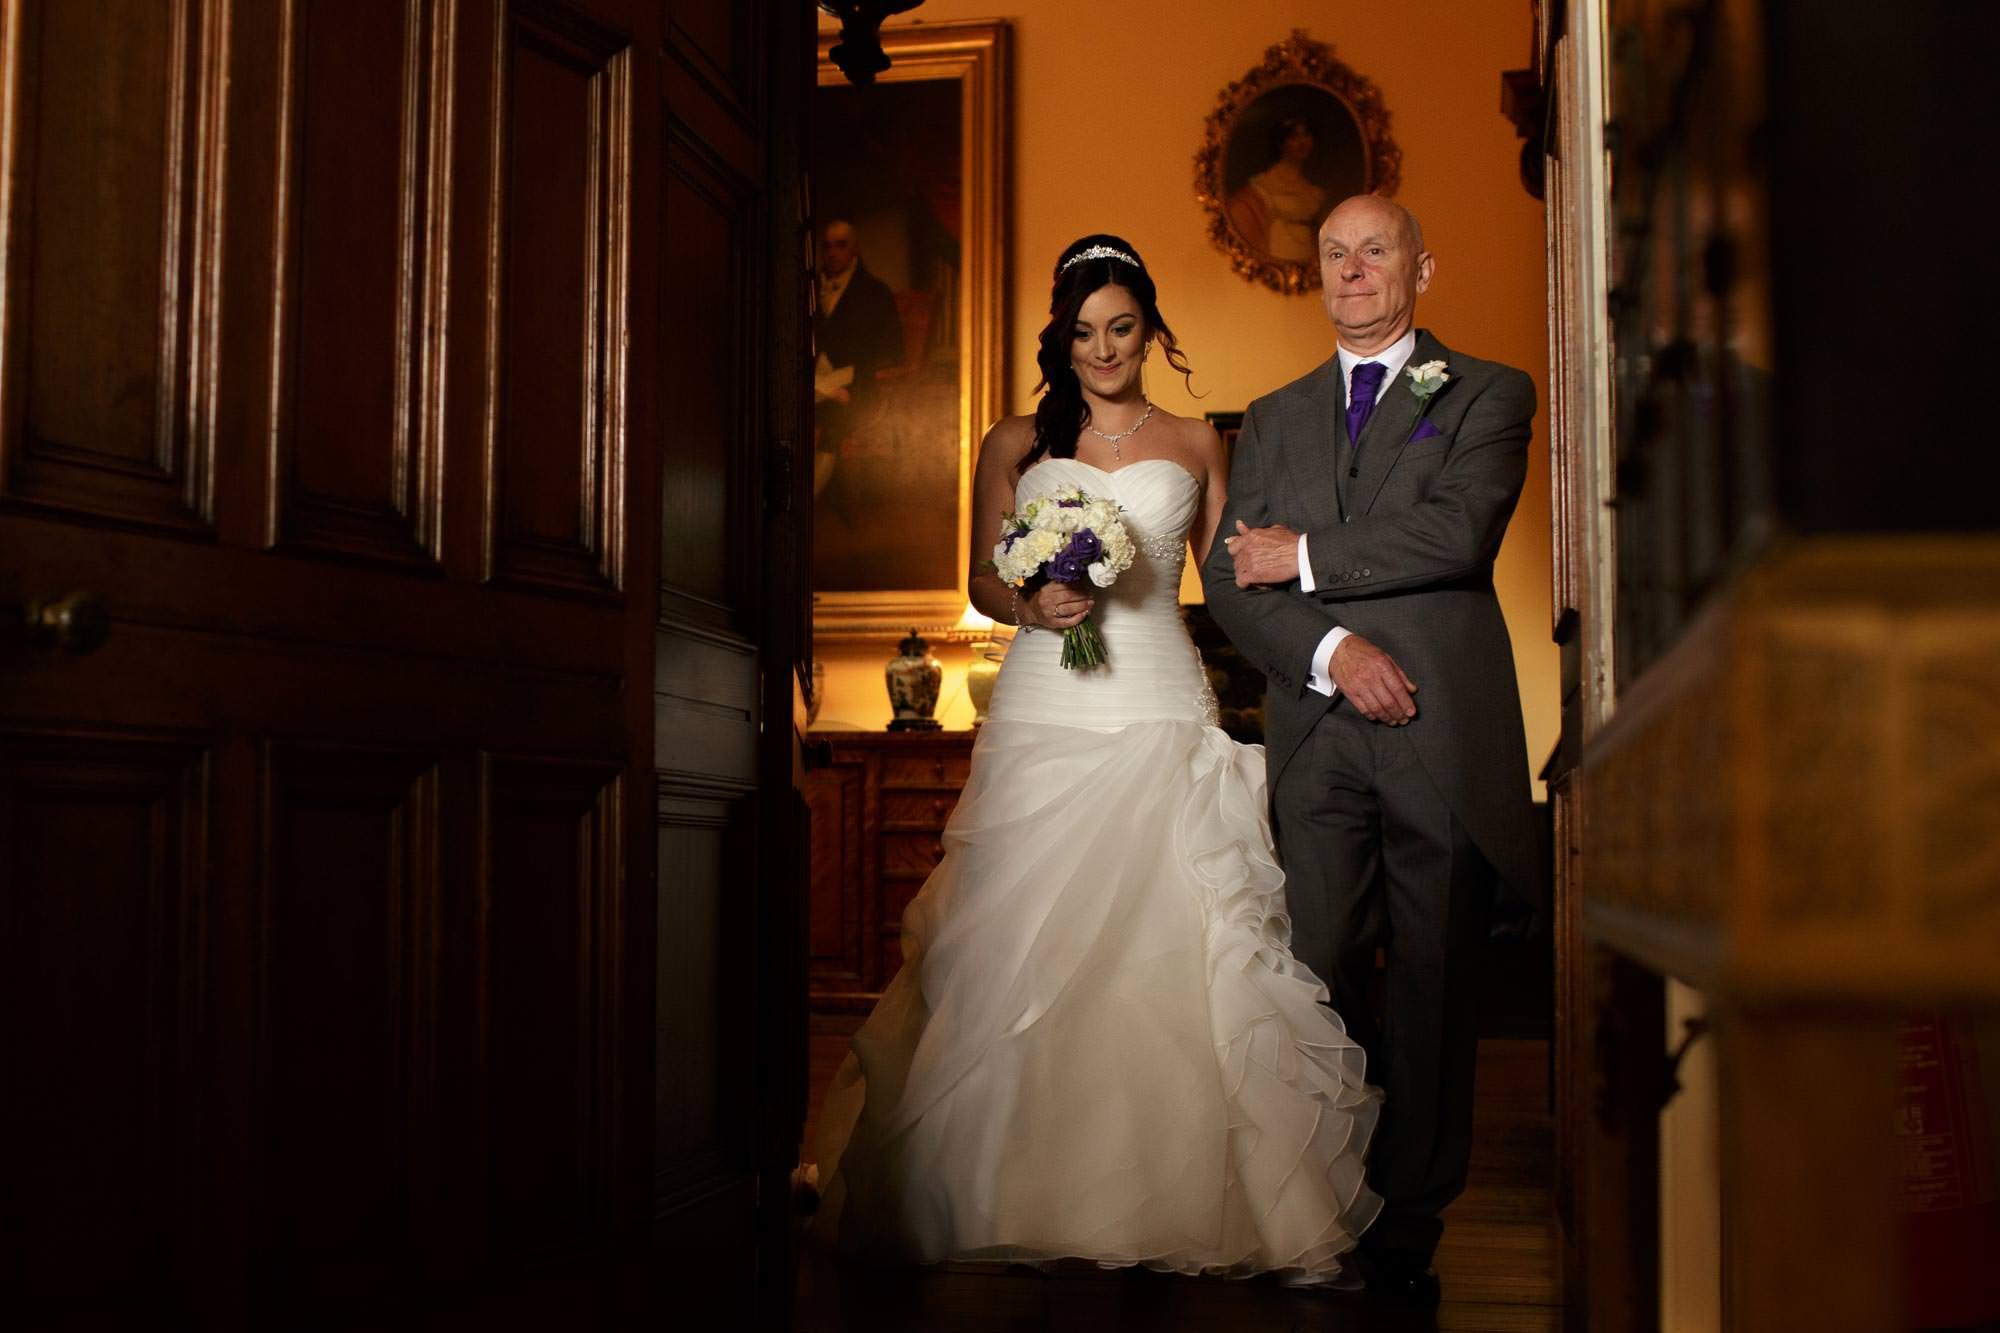 Dad walking his daughter down the aisle at Arley Hall Wedding